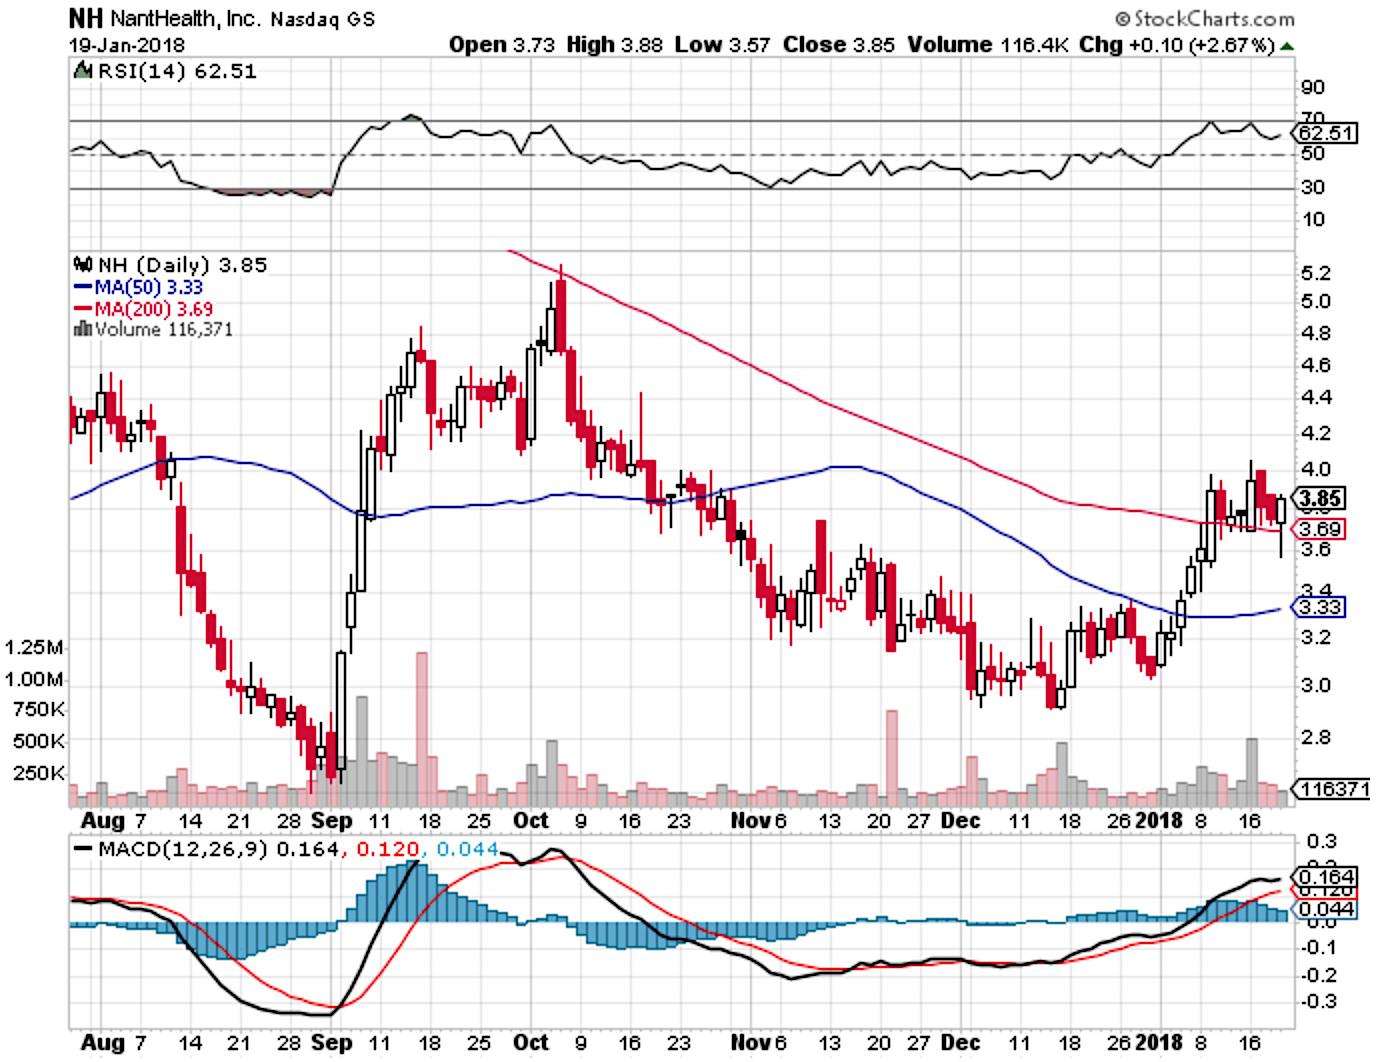 Juno juno therapeutics inc crowdsourced stock ratings saupload51wvigfsdlqbwxsxcyieafsx0opo5ixcbqtip12o2auxvfej1qhyk2v4iwjtlchhtpjl0uohqfbapxyggvhscjzk7utszaagvvdlnp0dzpwshk3iwyztnr6uaegcrj4gijj1v5othumb1g biocorpaavc Images